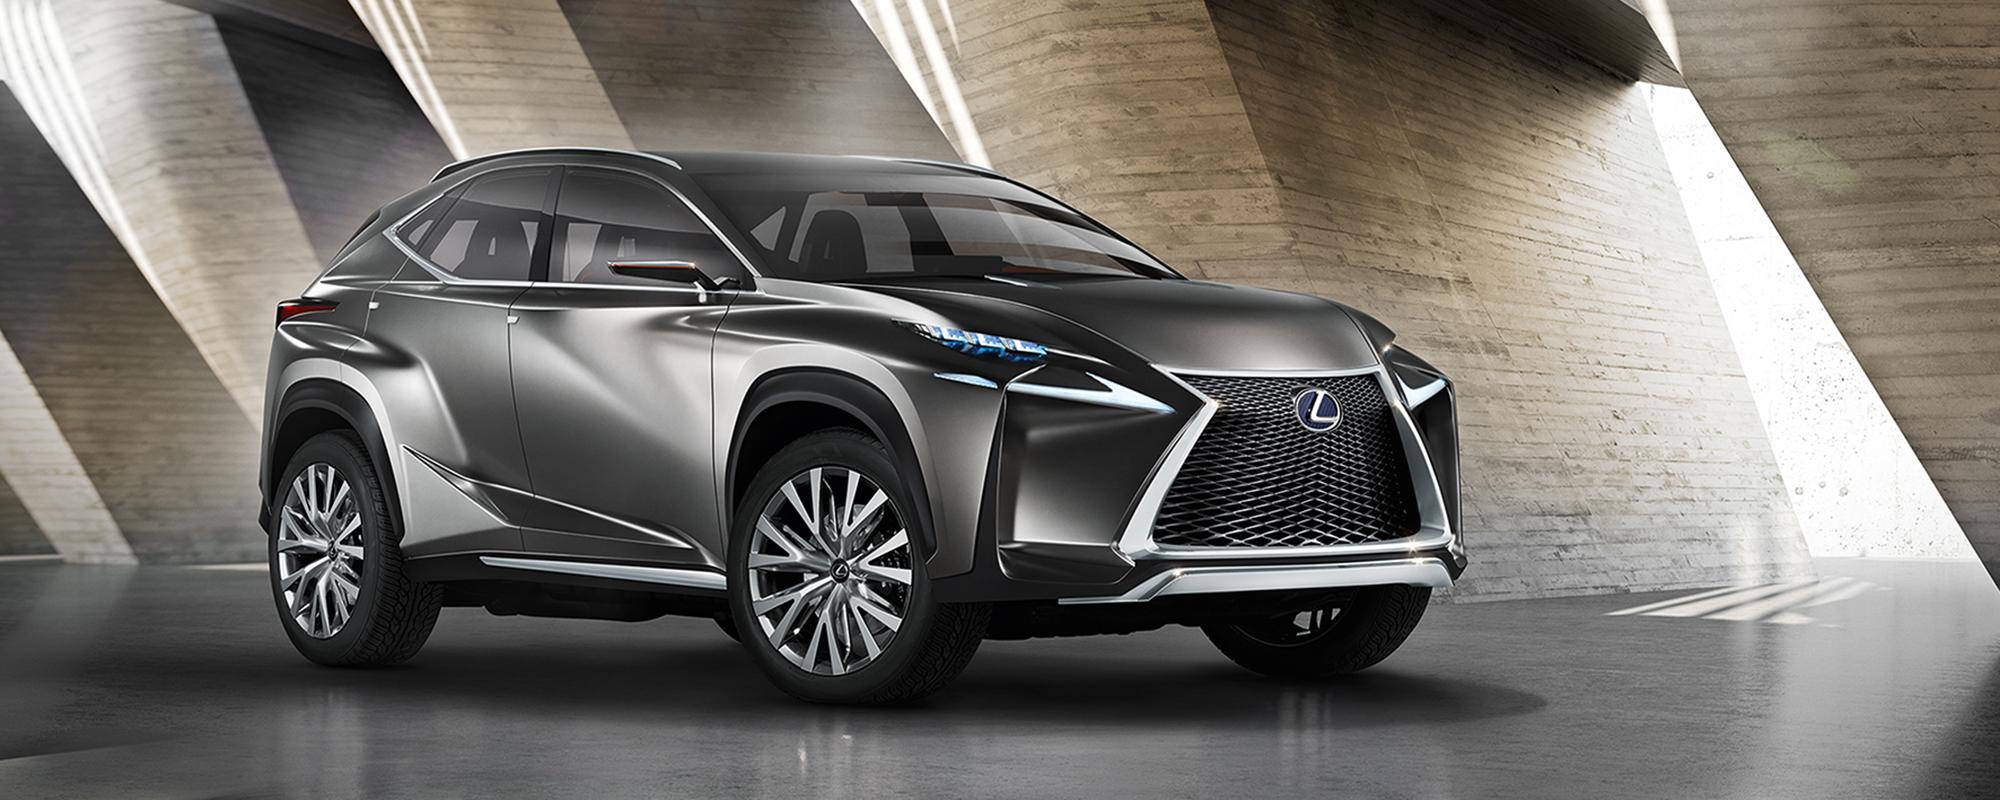 LF-NX Crossover, Lexus' wereldpremière concept car